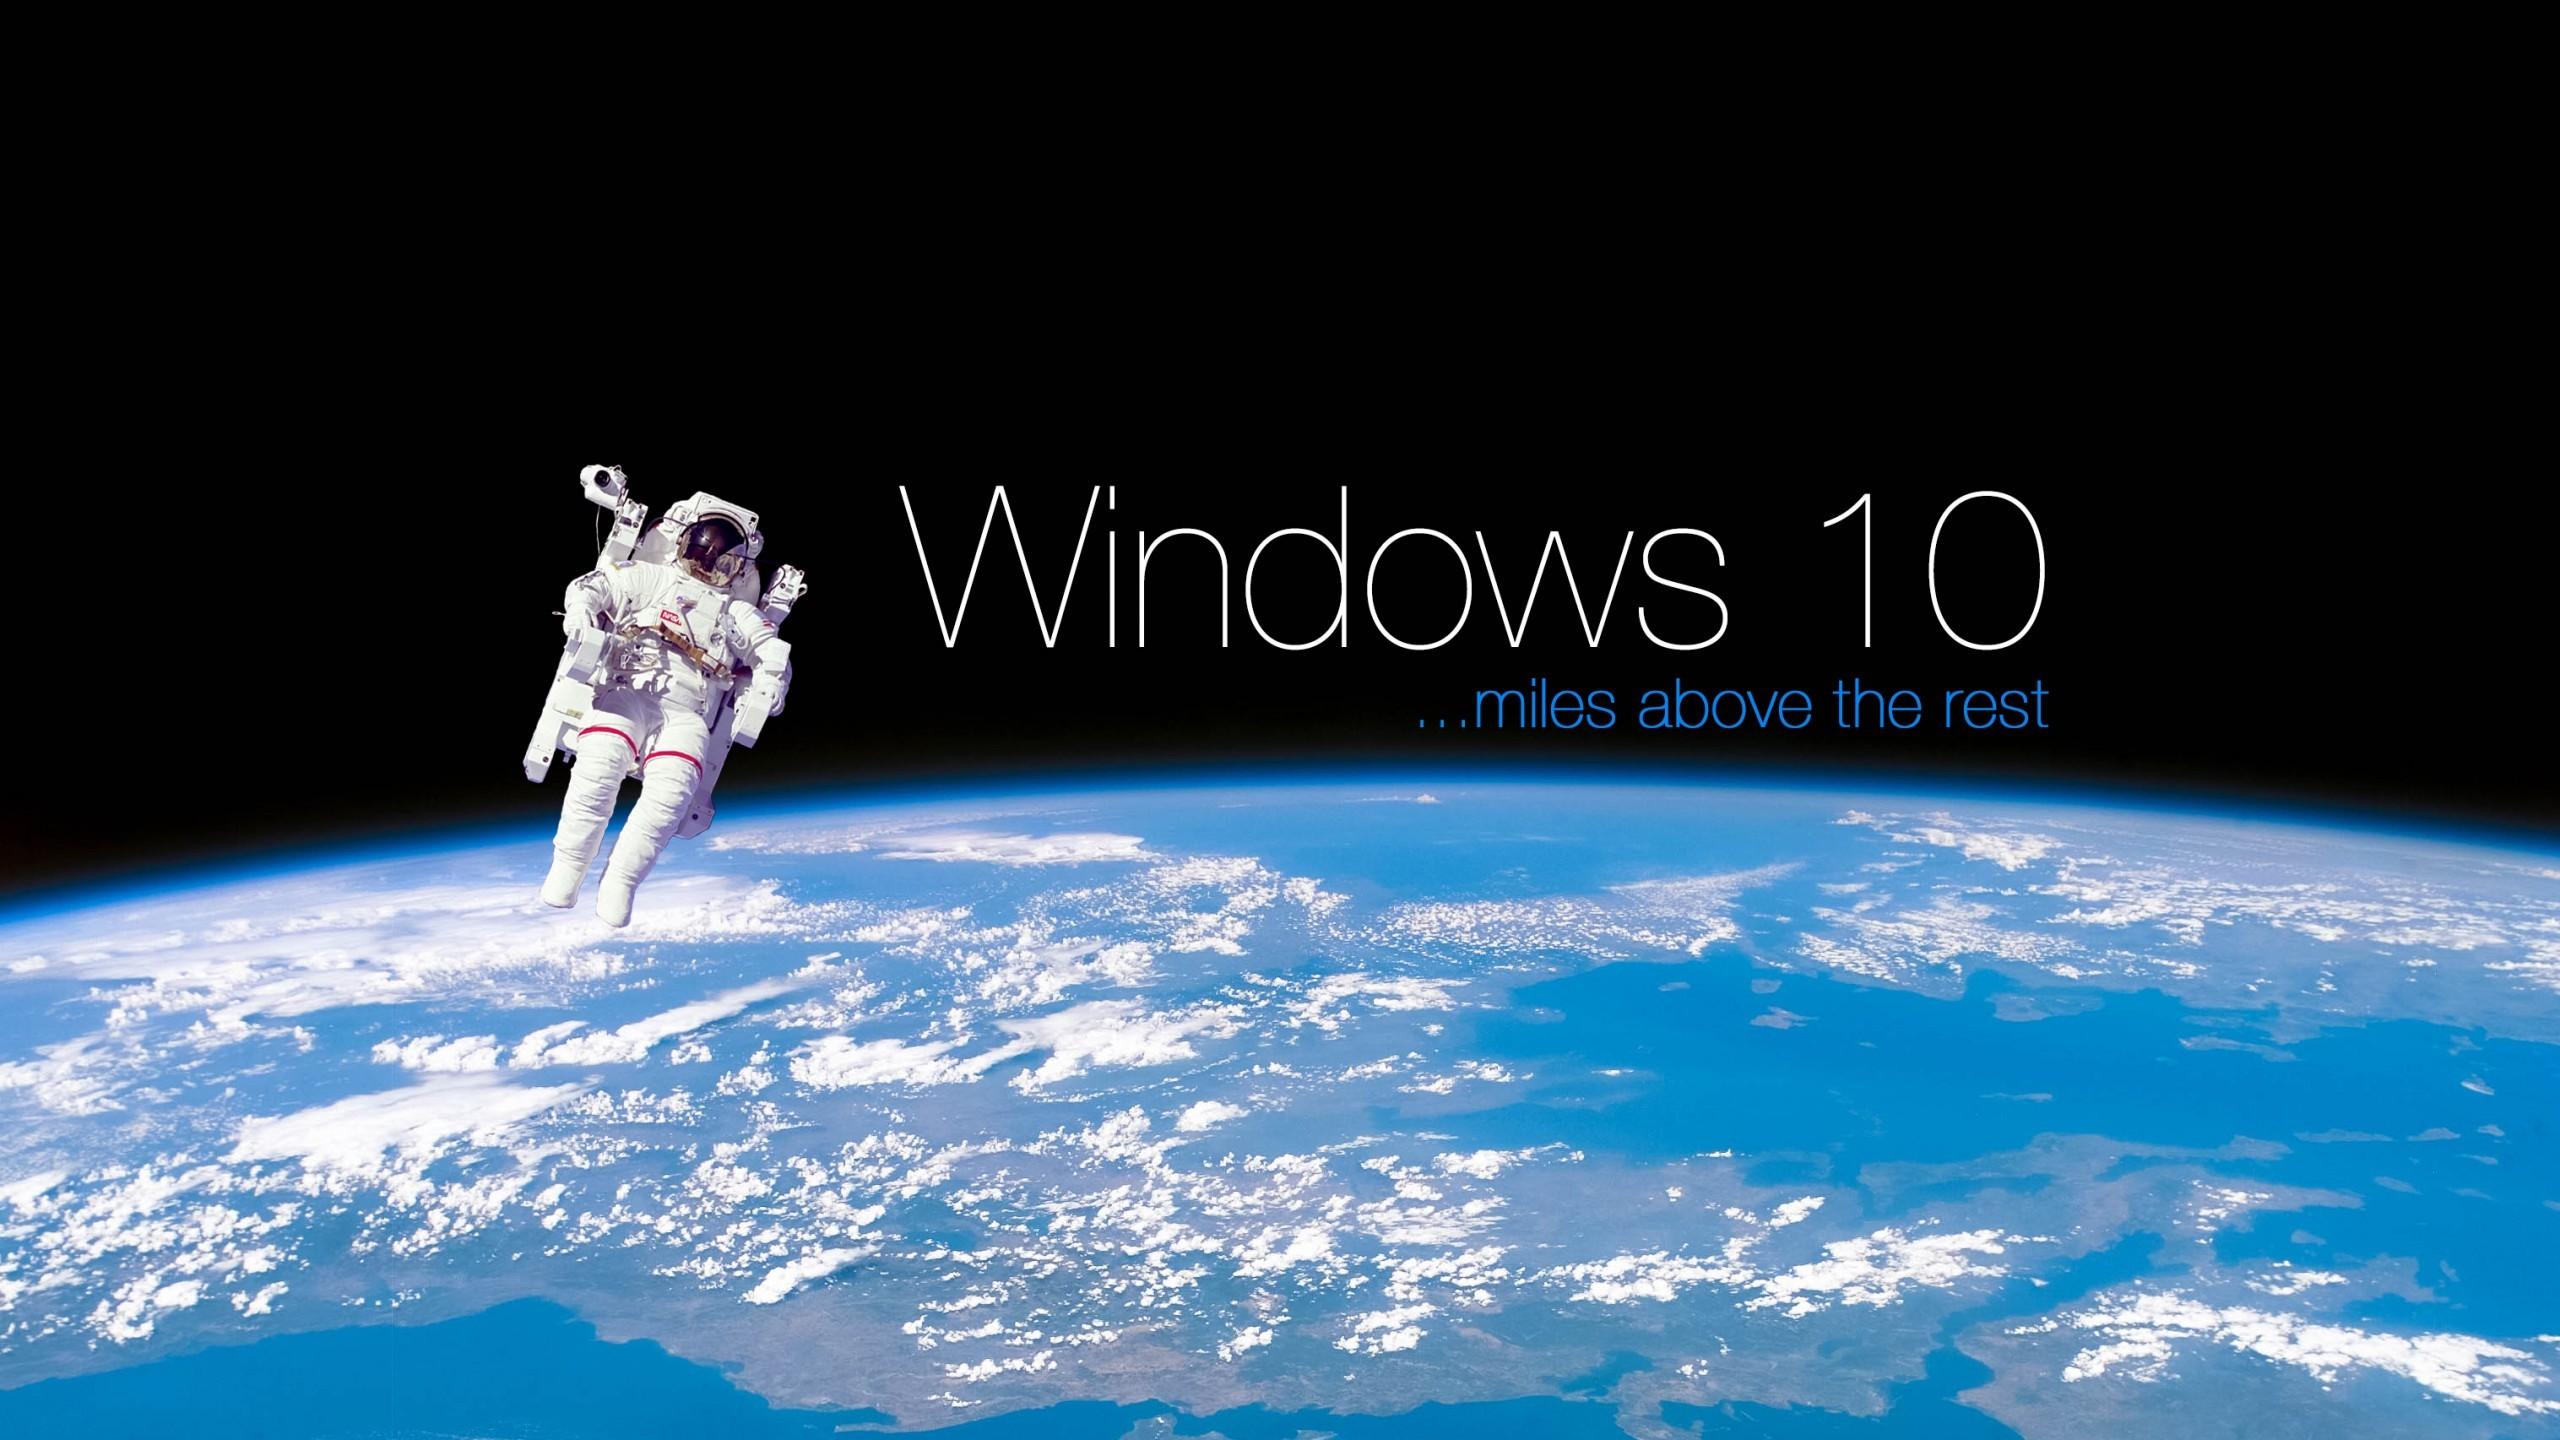 Windows 10 space 4k wallpaper